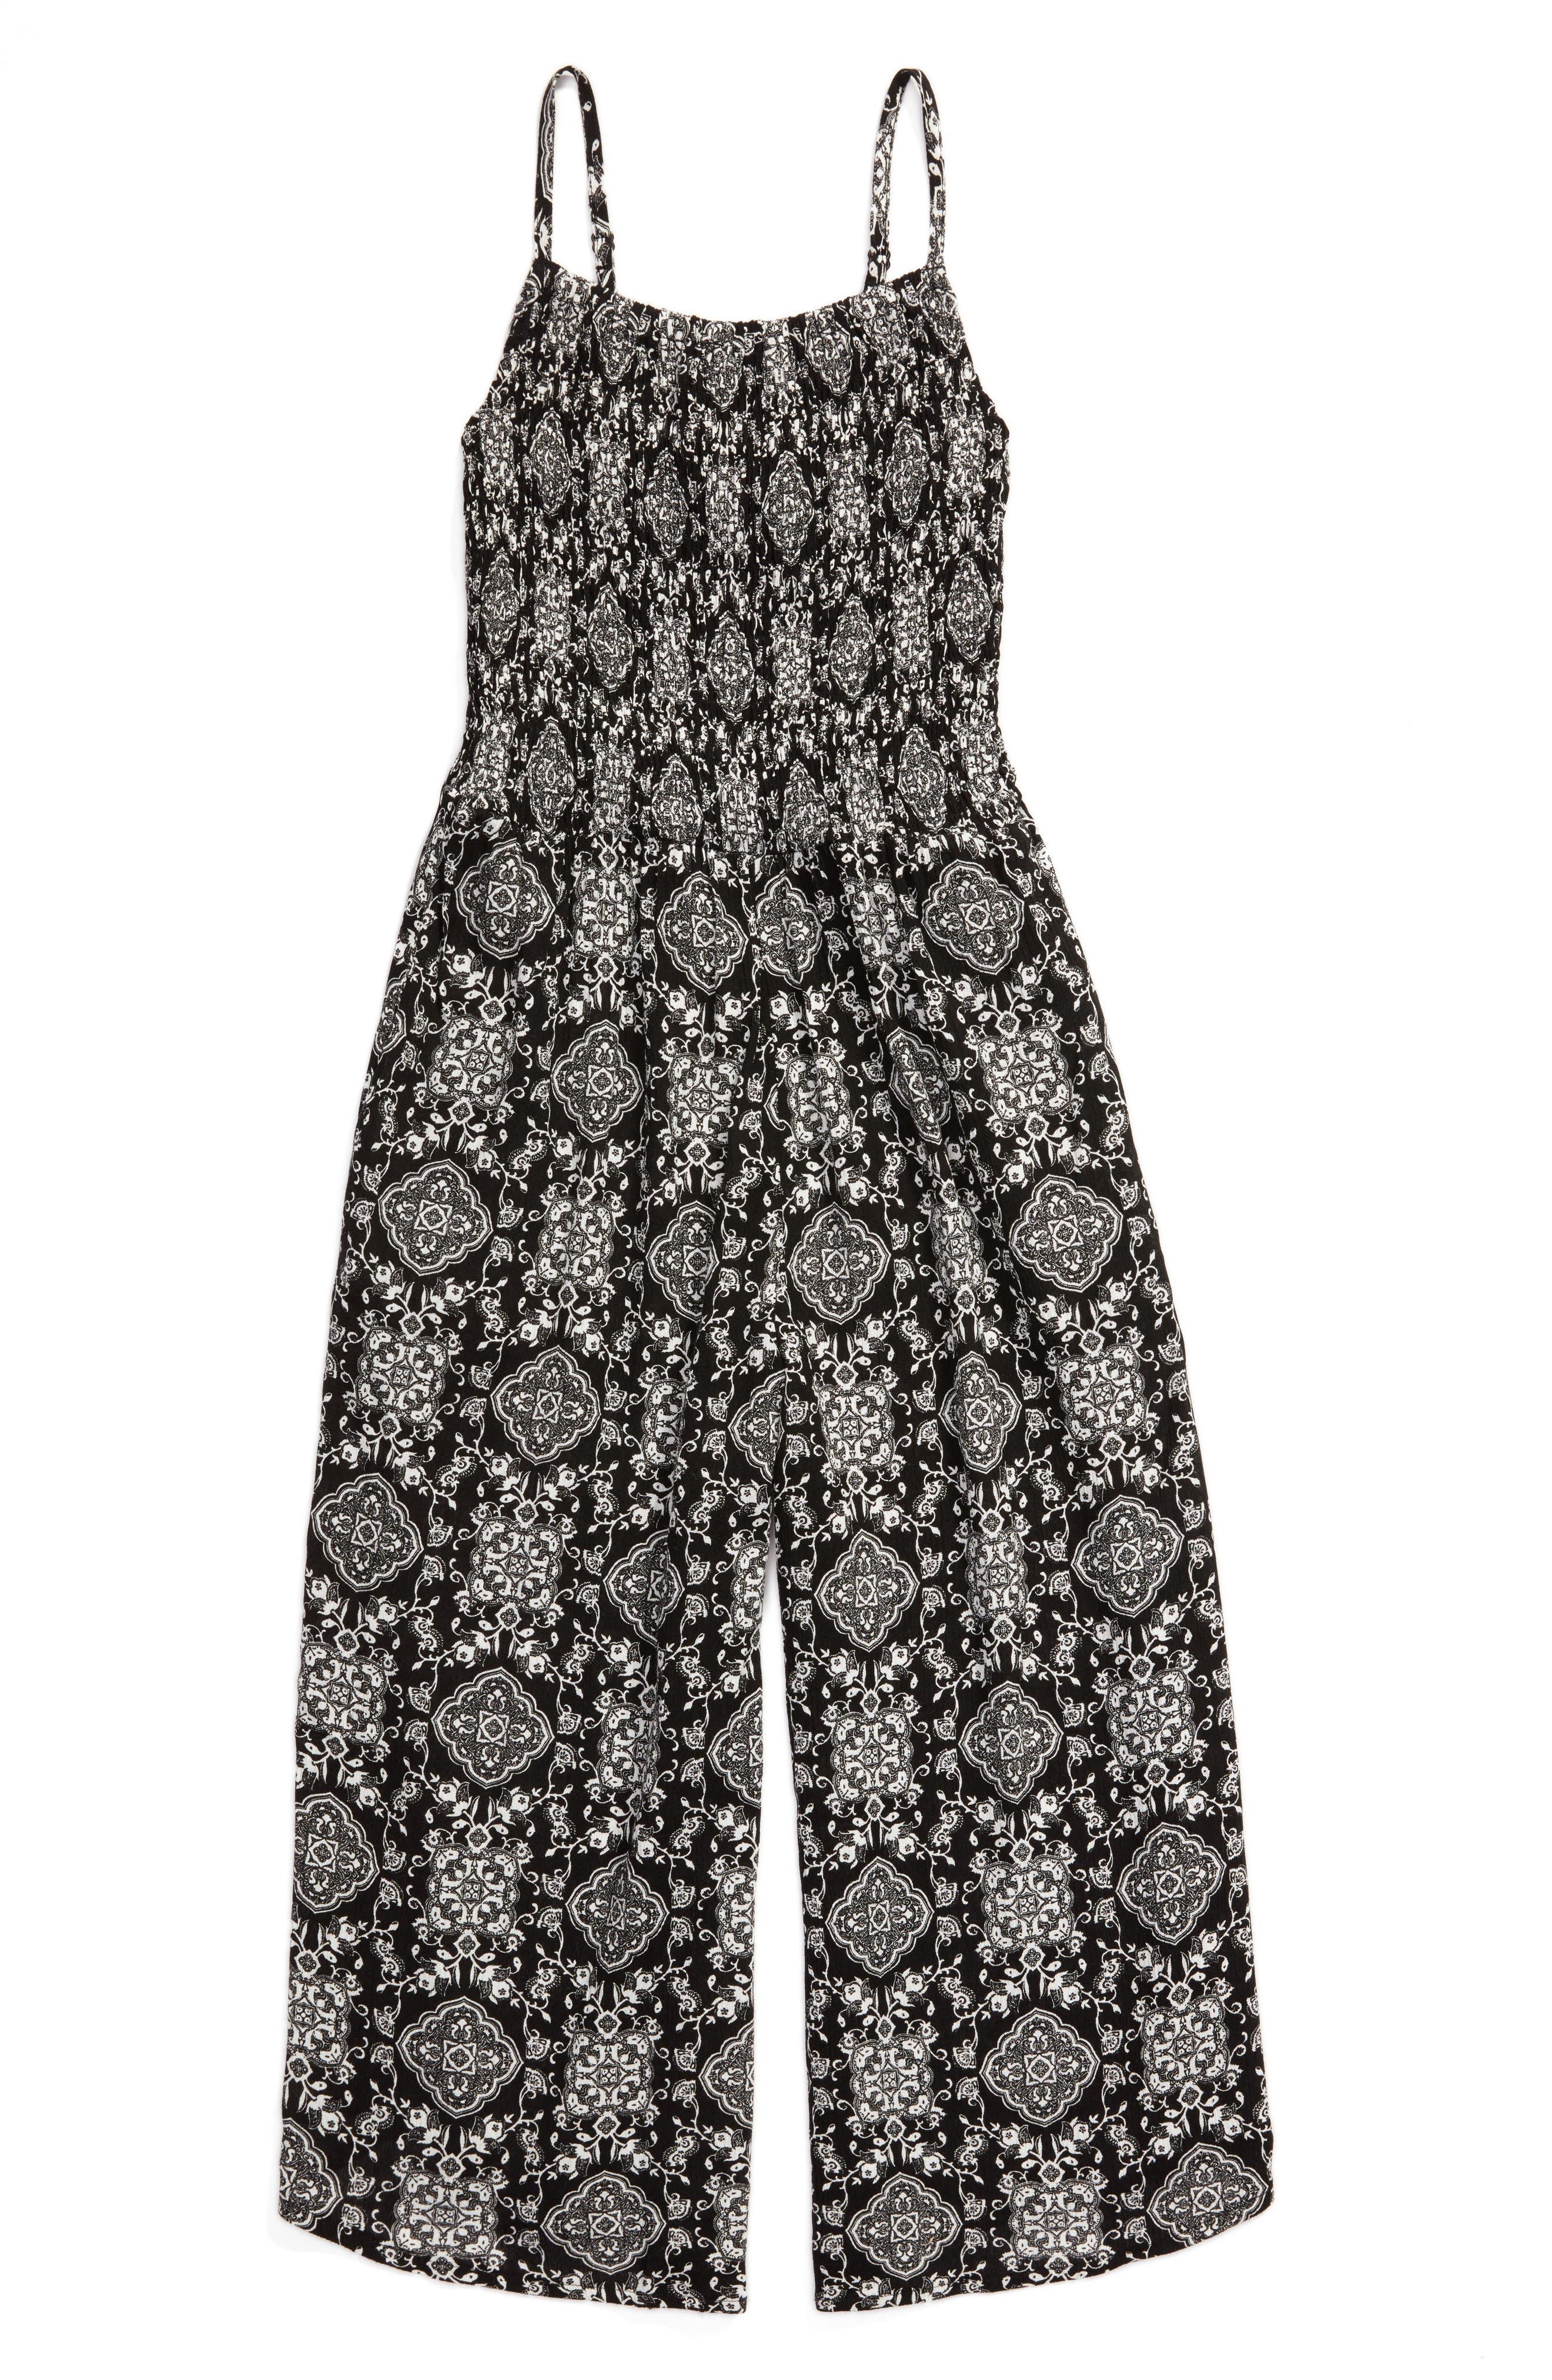 Smocked Jumpsuit,                         Main,                         color, Black/ White